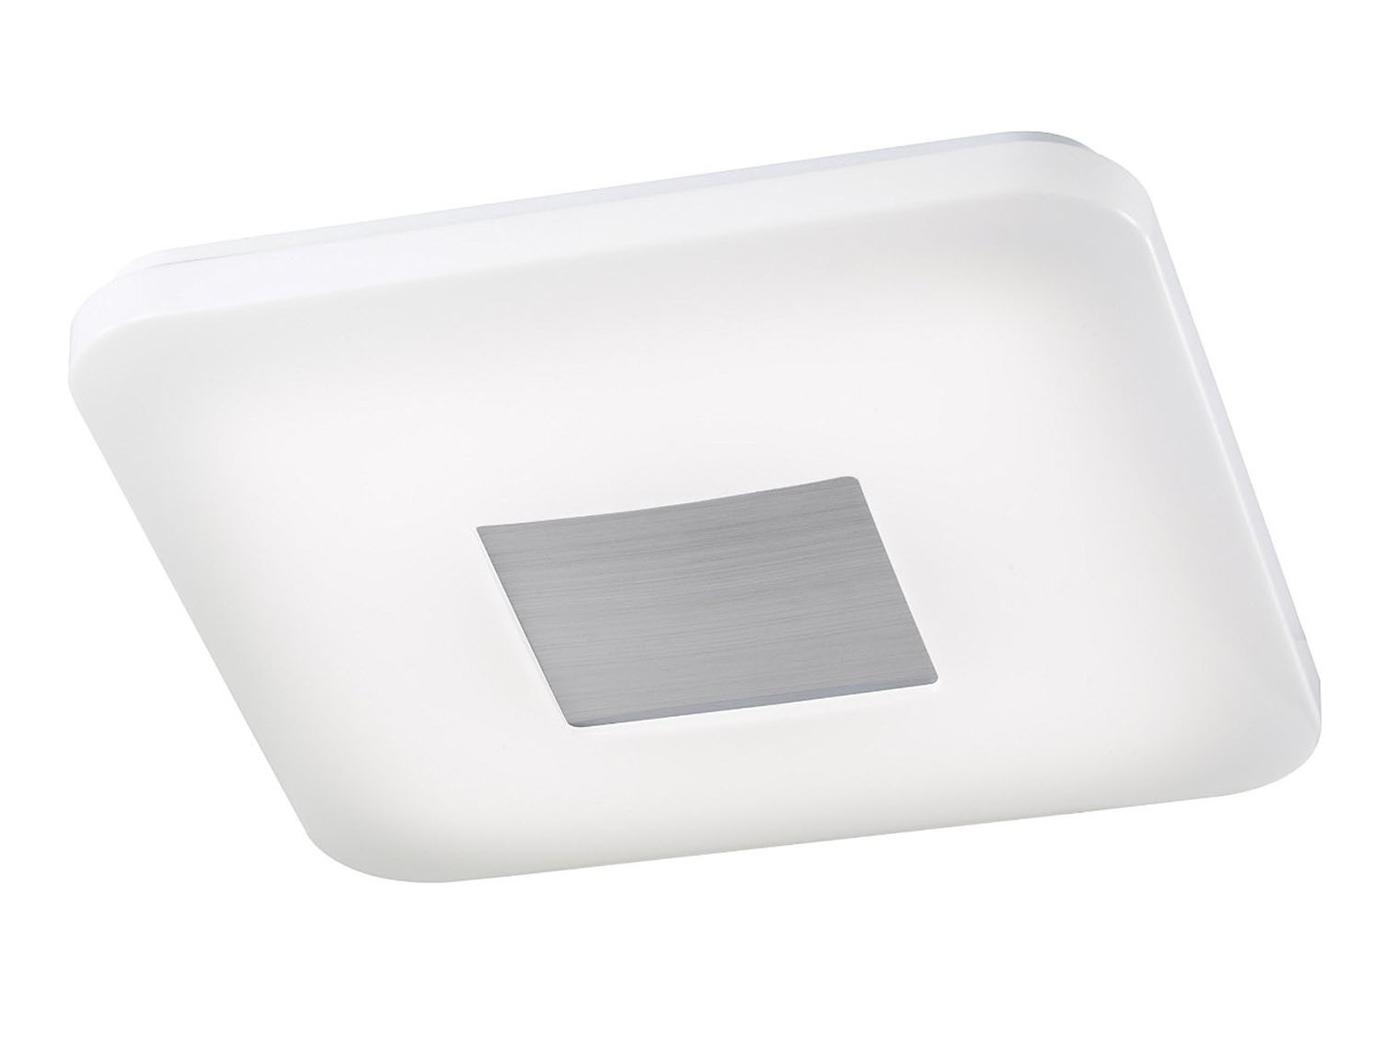 led deckenleuchte dimmbar inkl fb nachtlicht action by. Black Bedroom Furniture Sets. Home Design Ideas